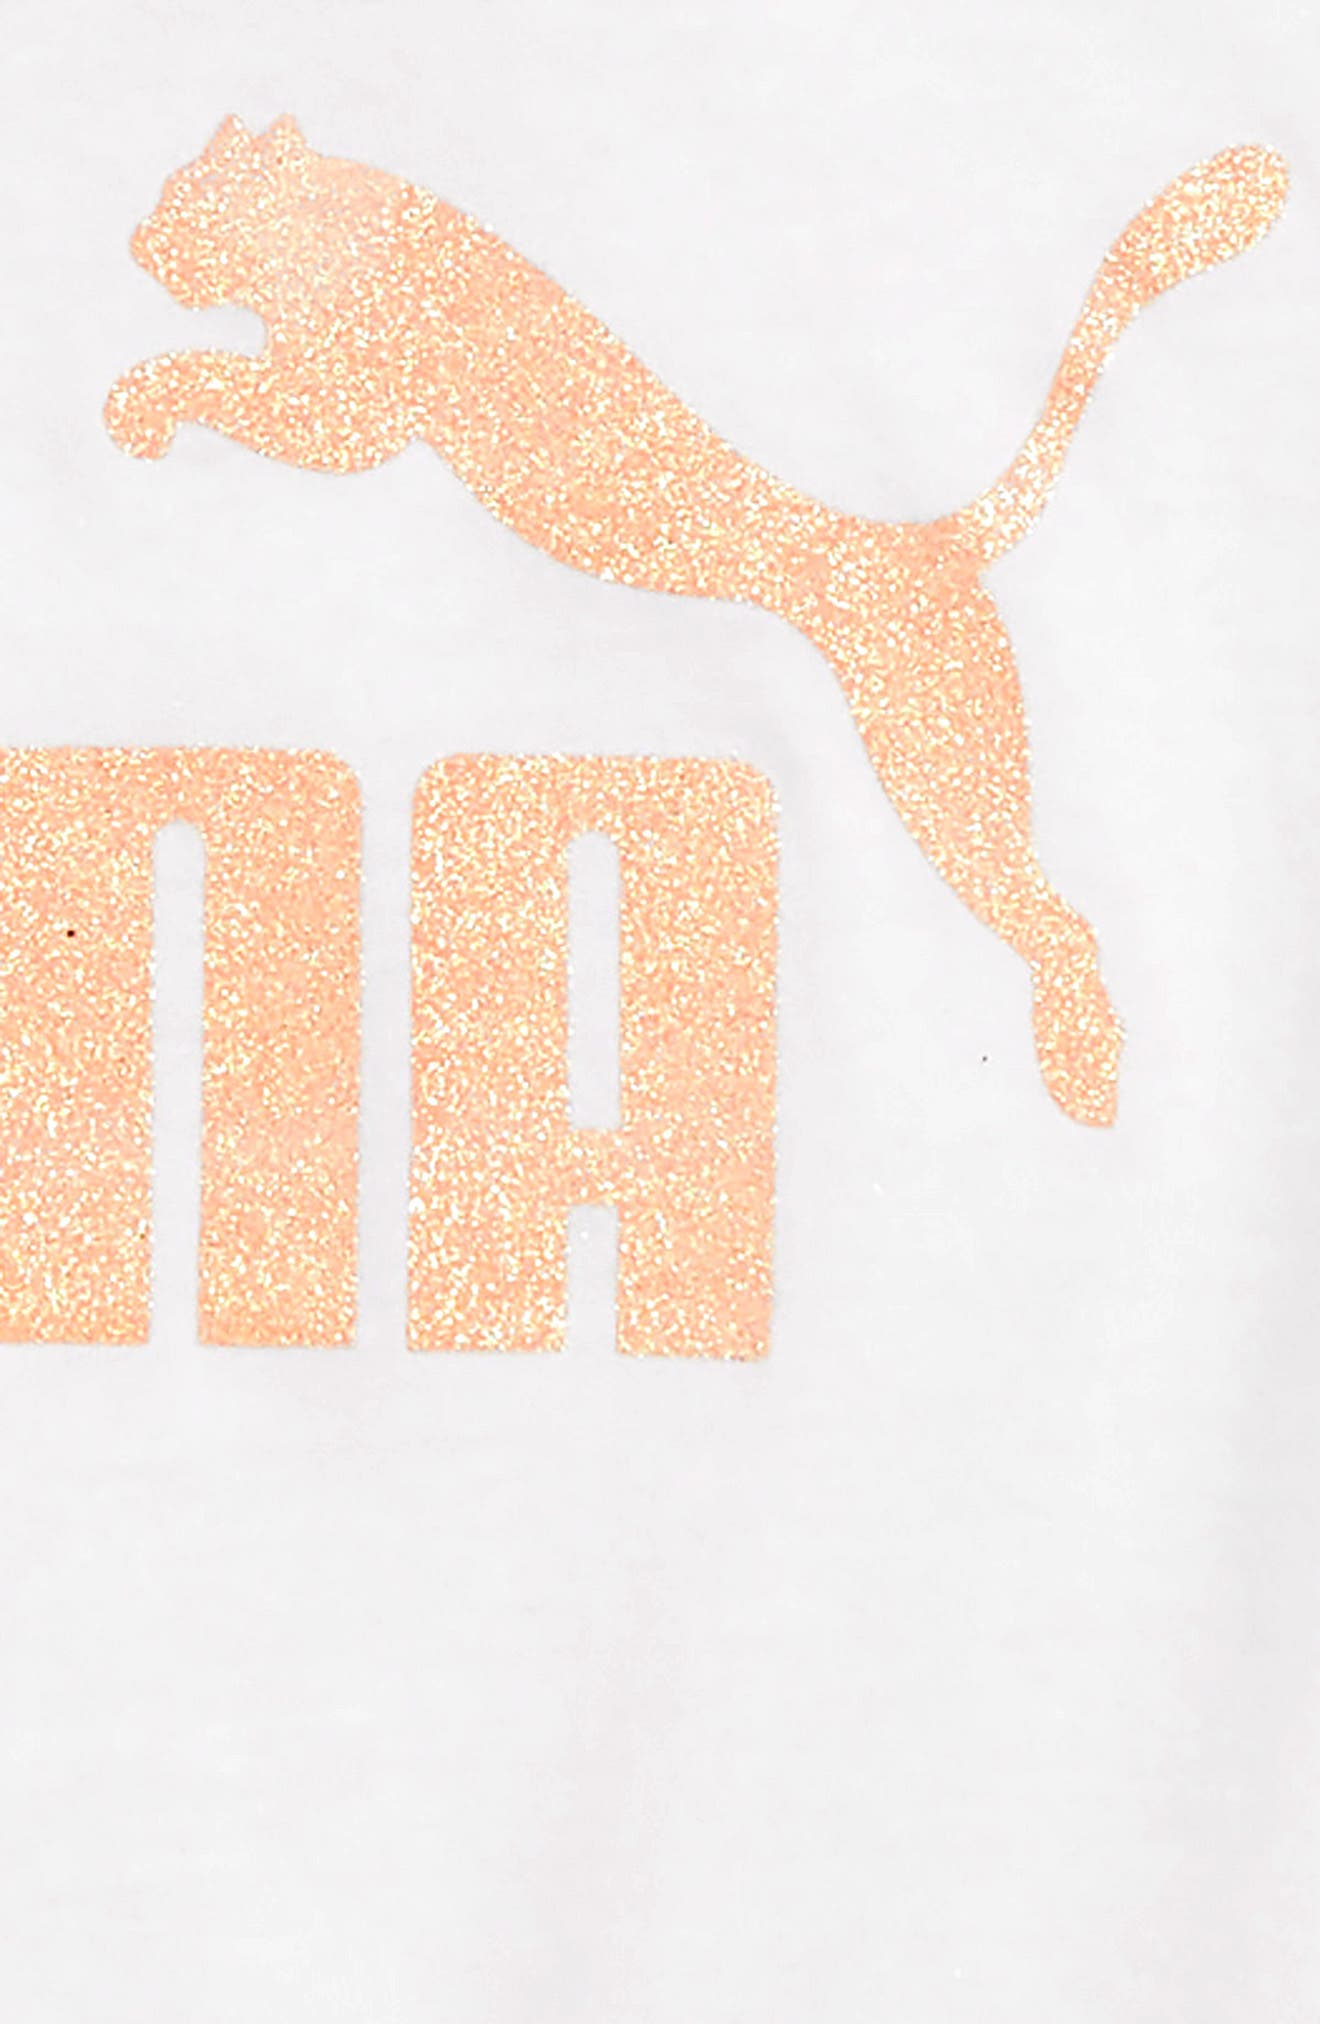 PUMA,                             Glitter Logo Tee,                             Alternate thumbnail 2, color,                             PUMA WHITE